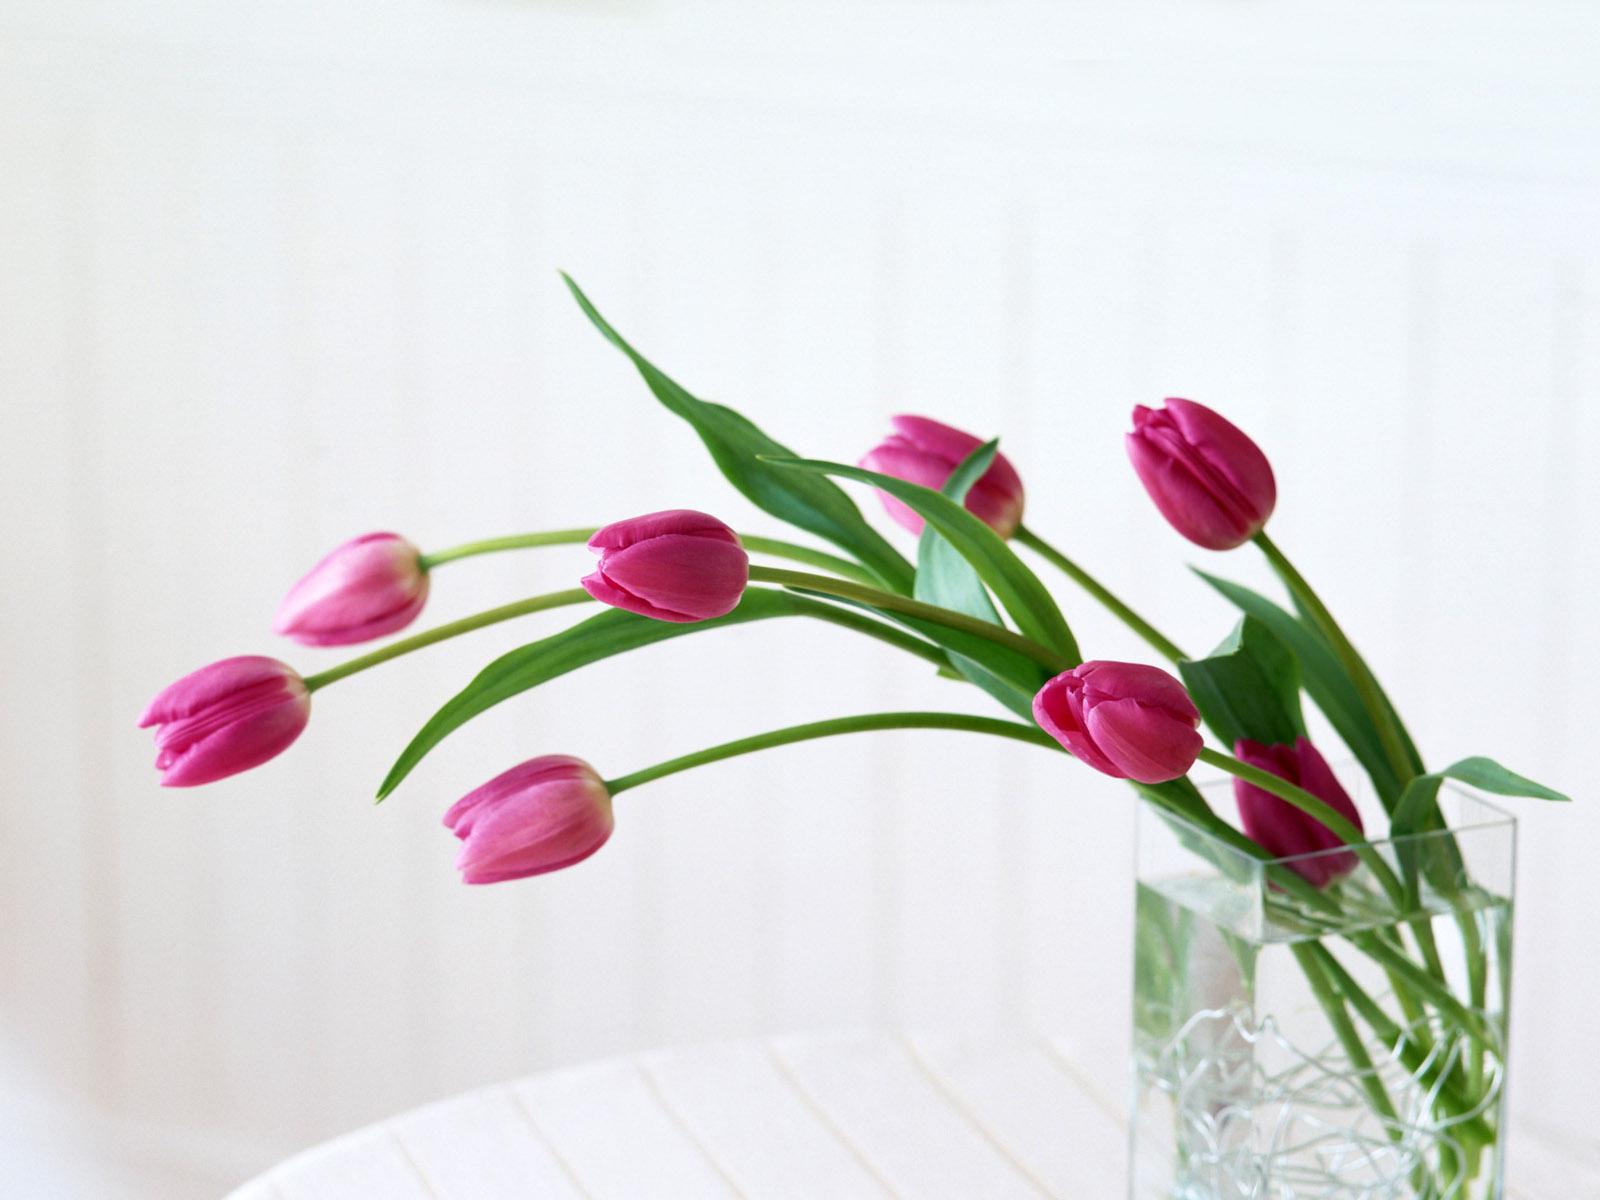 http://1.bp.blogspot.com/-7wNefzpQF44/T9alDCkg7ZI/AAAAAAAAHu0/XczQWBOOwJ4/s1600/flower%2Bbackground%2B04.jpg